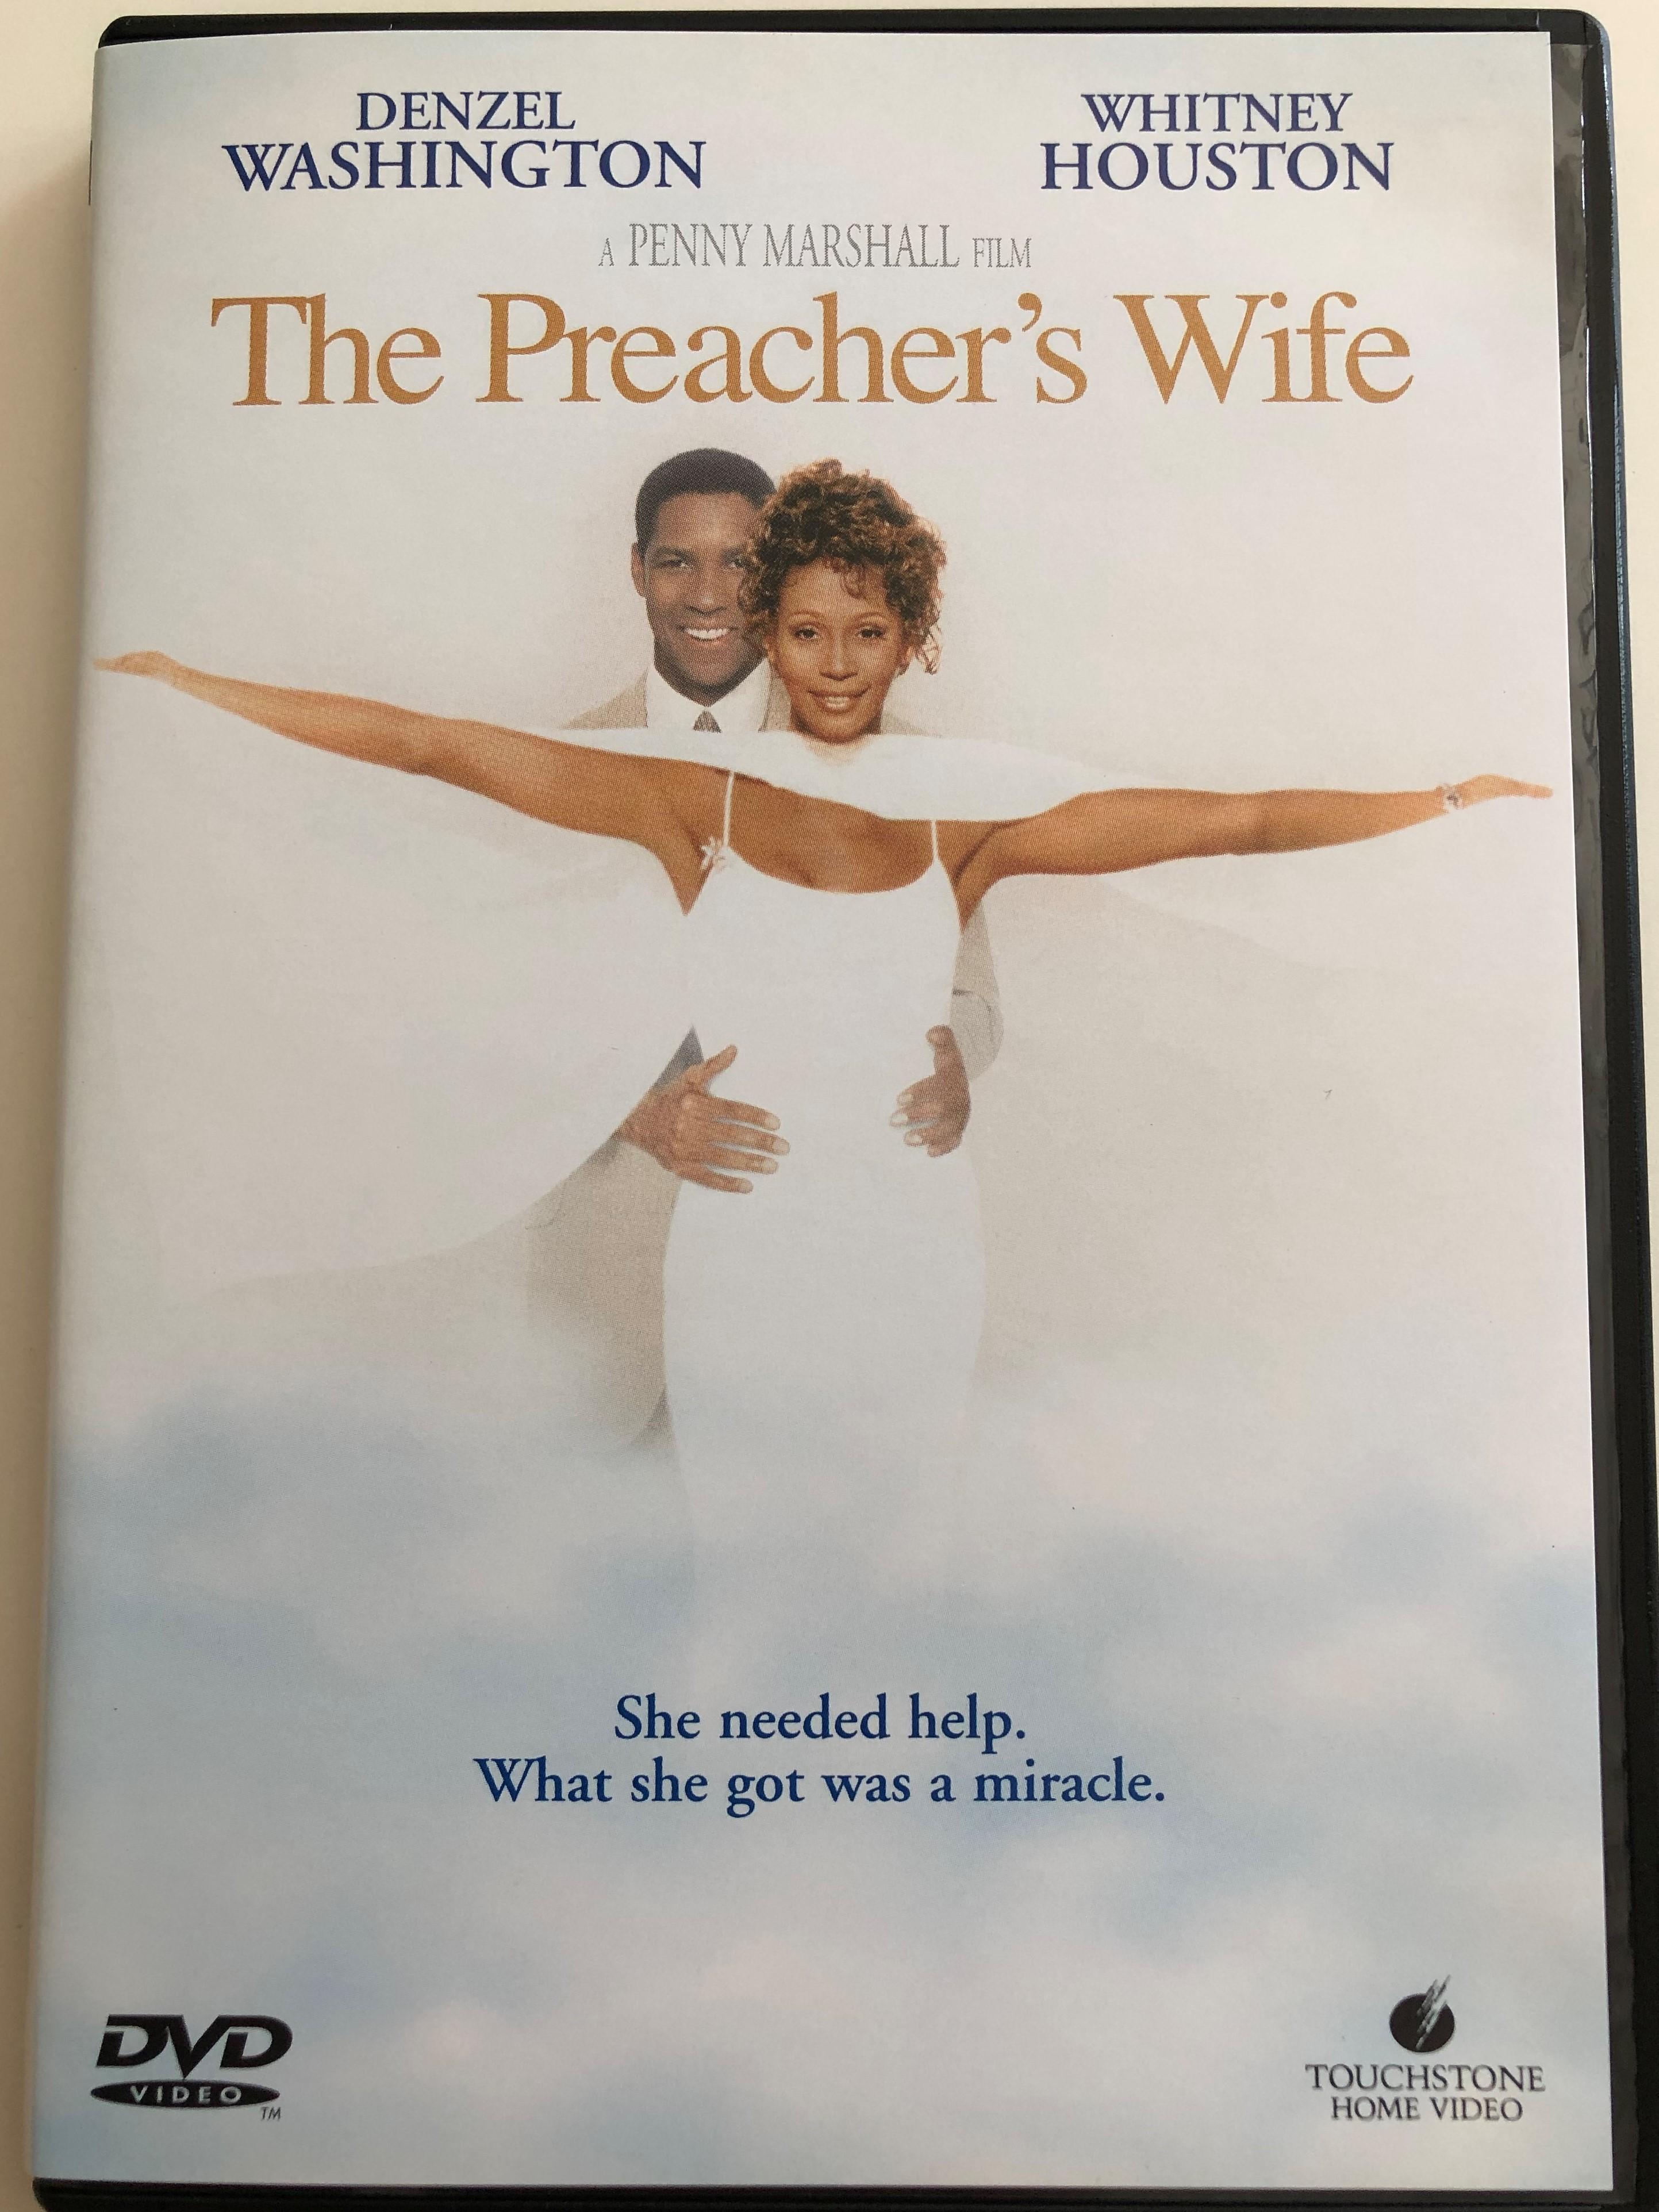 the-preacher-s-wife-dvd-1996-rendezvous-mit-einem-engel-directed-by-penny-marshall-starring-denzel-washington-whitney-houston-courtney-b.-vance-gregory-hines-jenifer-lewis-loretta-devine-1-.jpg